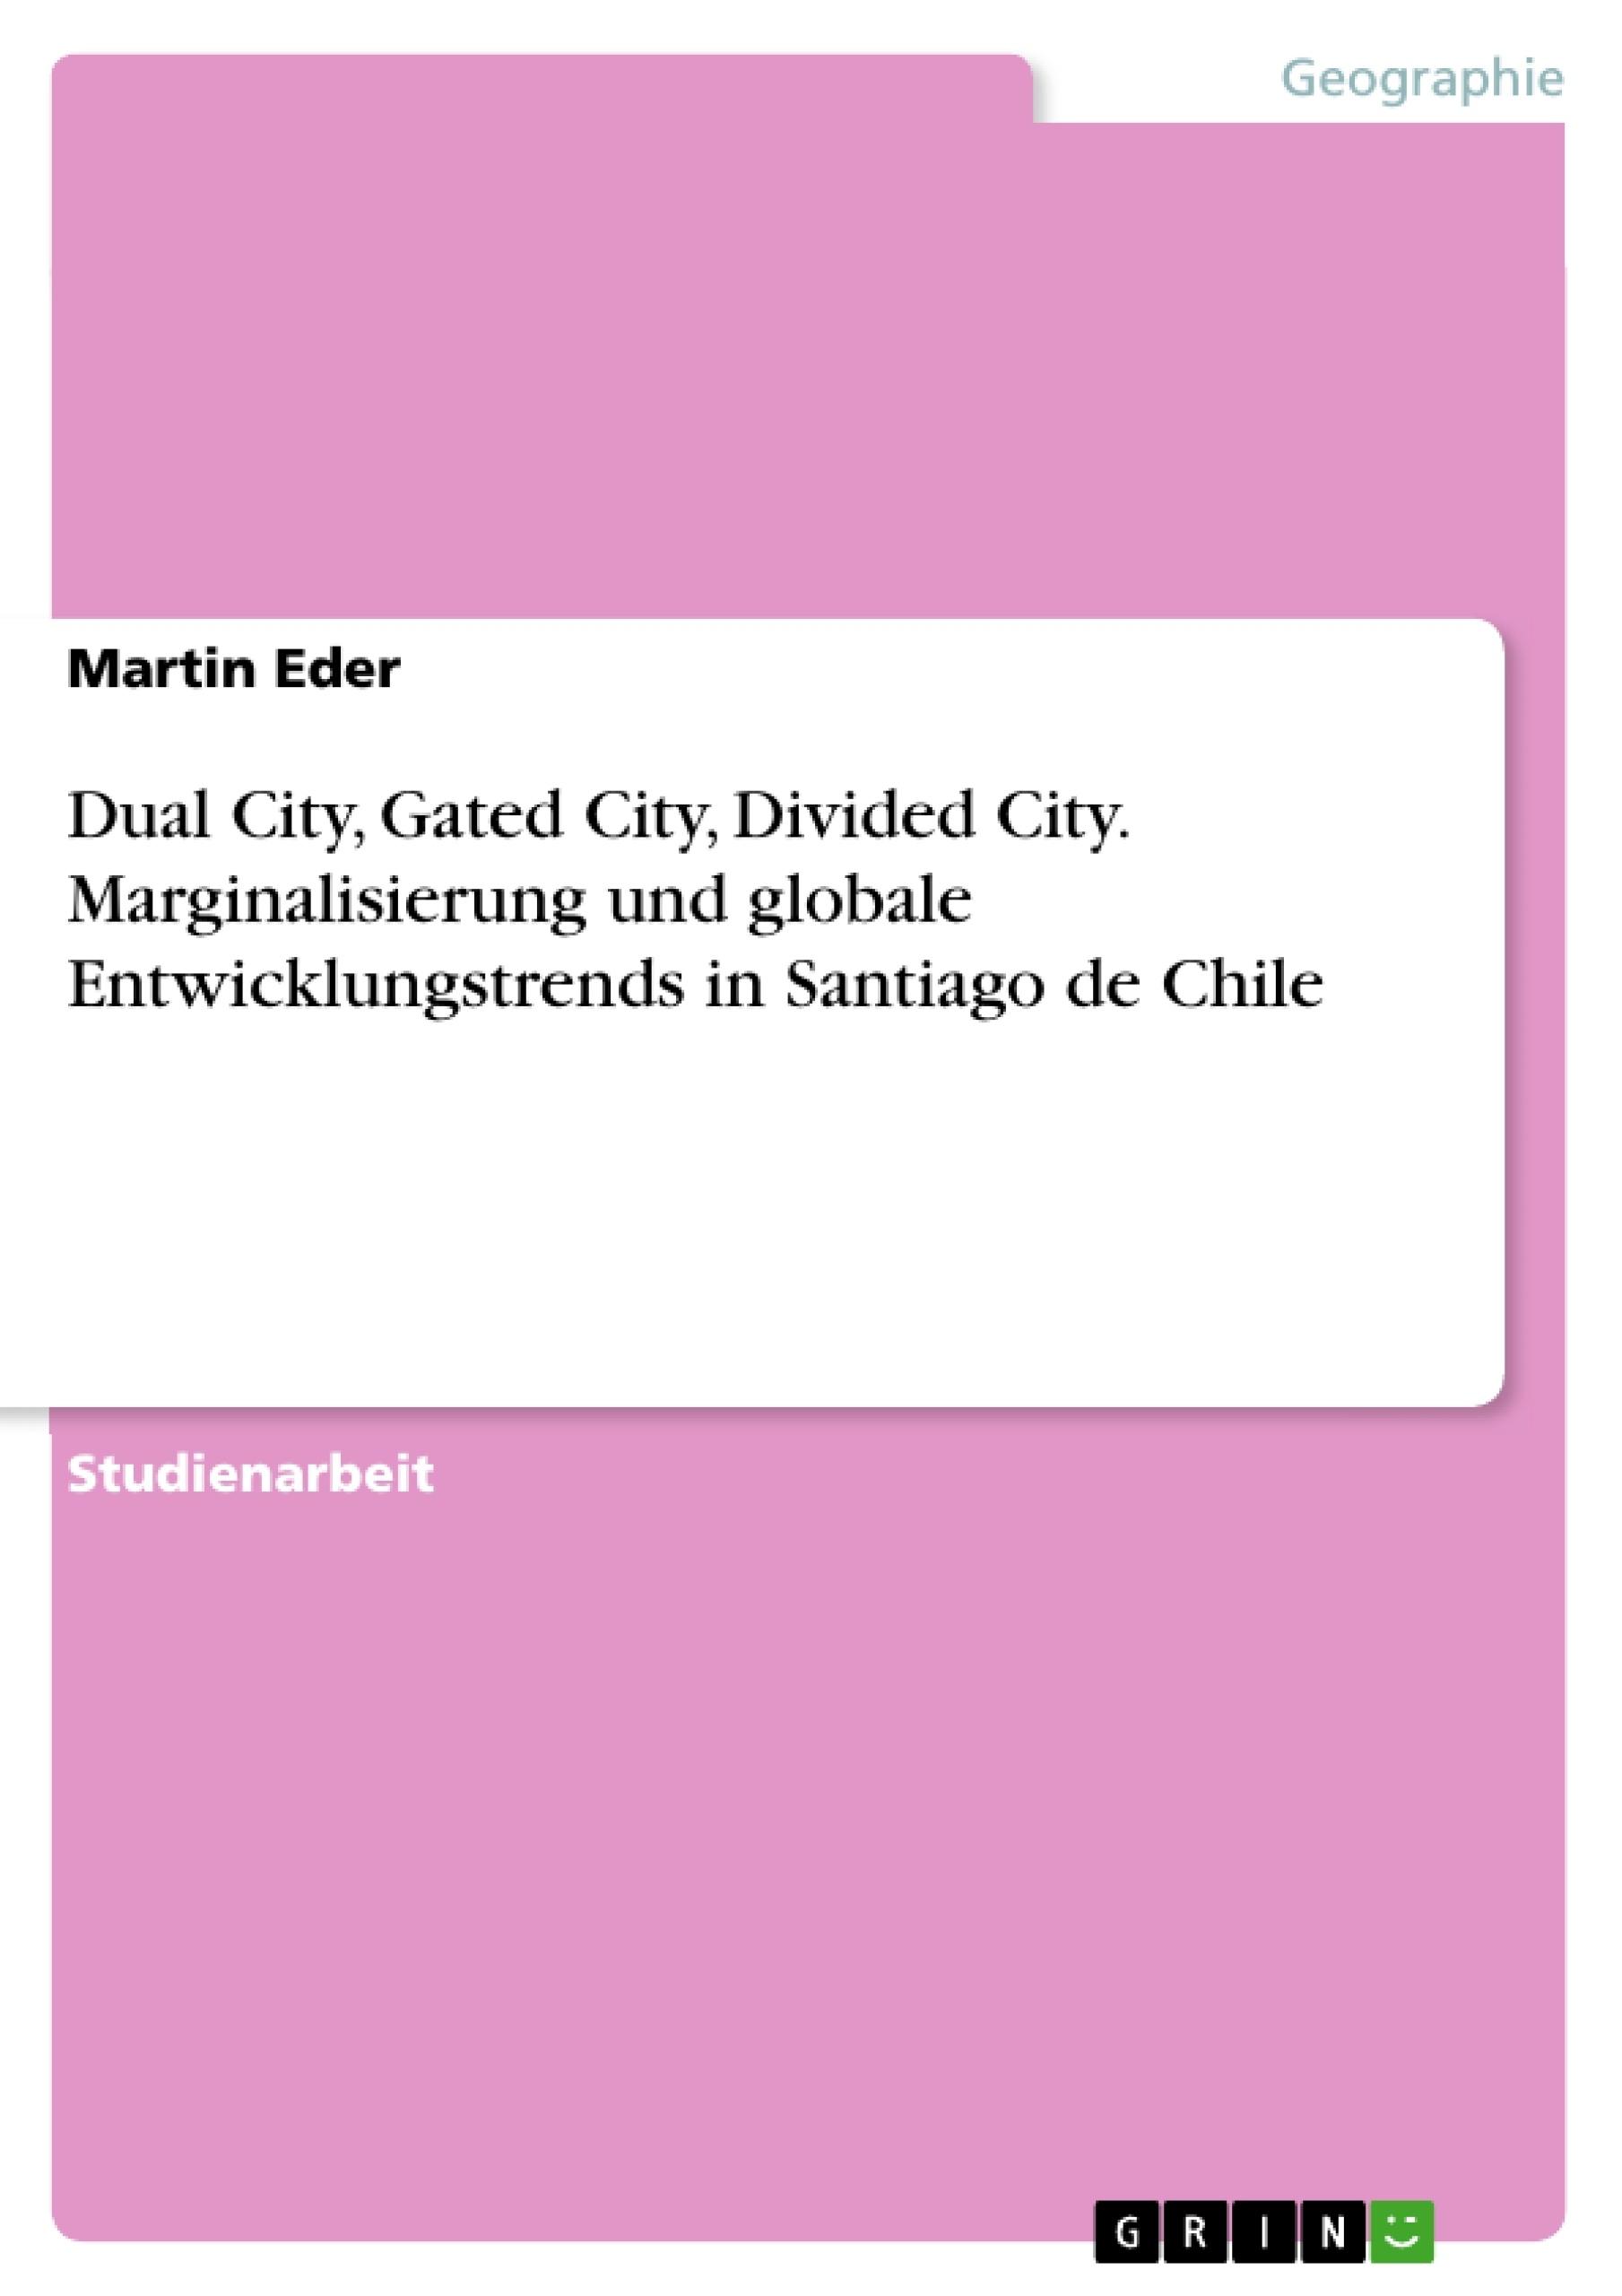 Titel: Dual City, Gated City, Divided City. Marginalisierung und globale Entwicklungstrends in Santiago de Chile